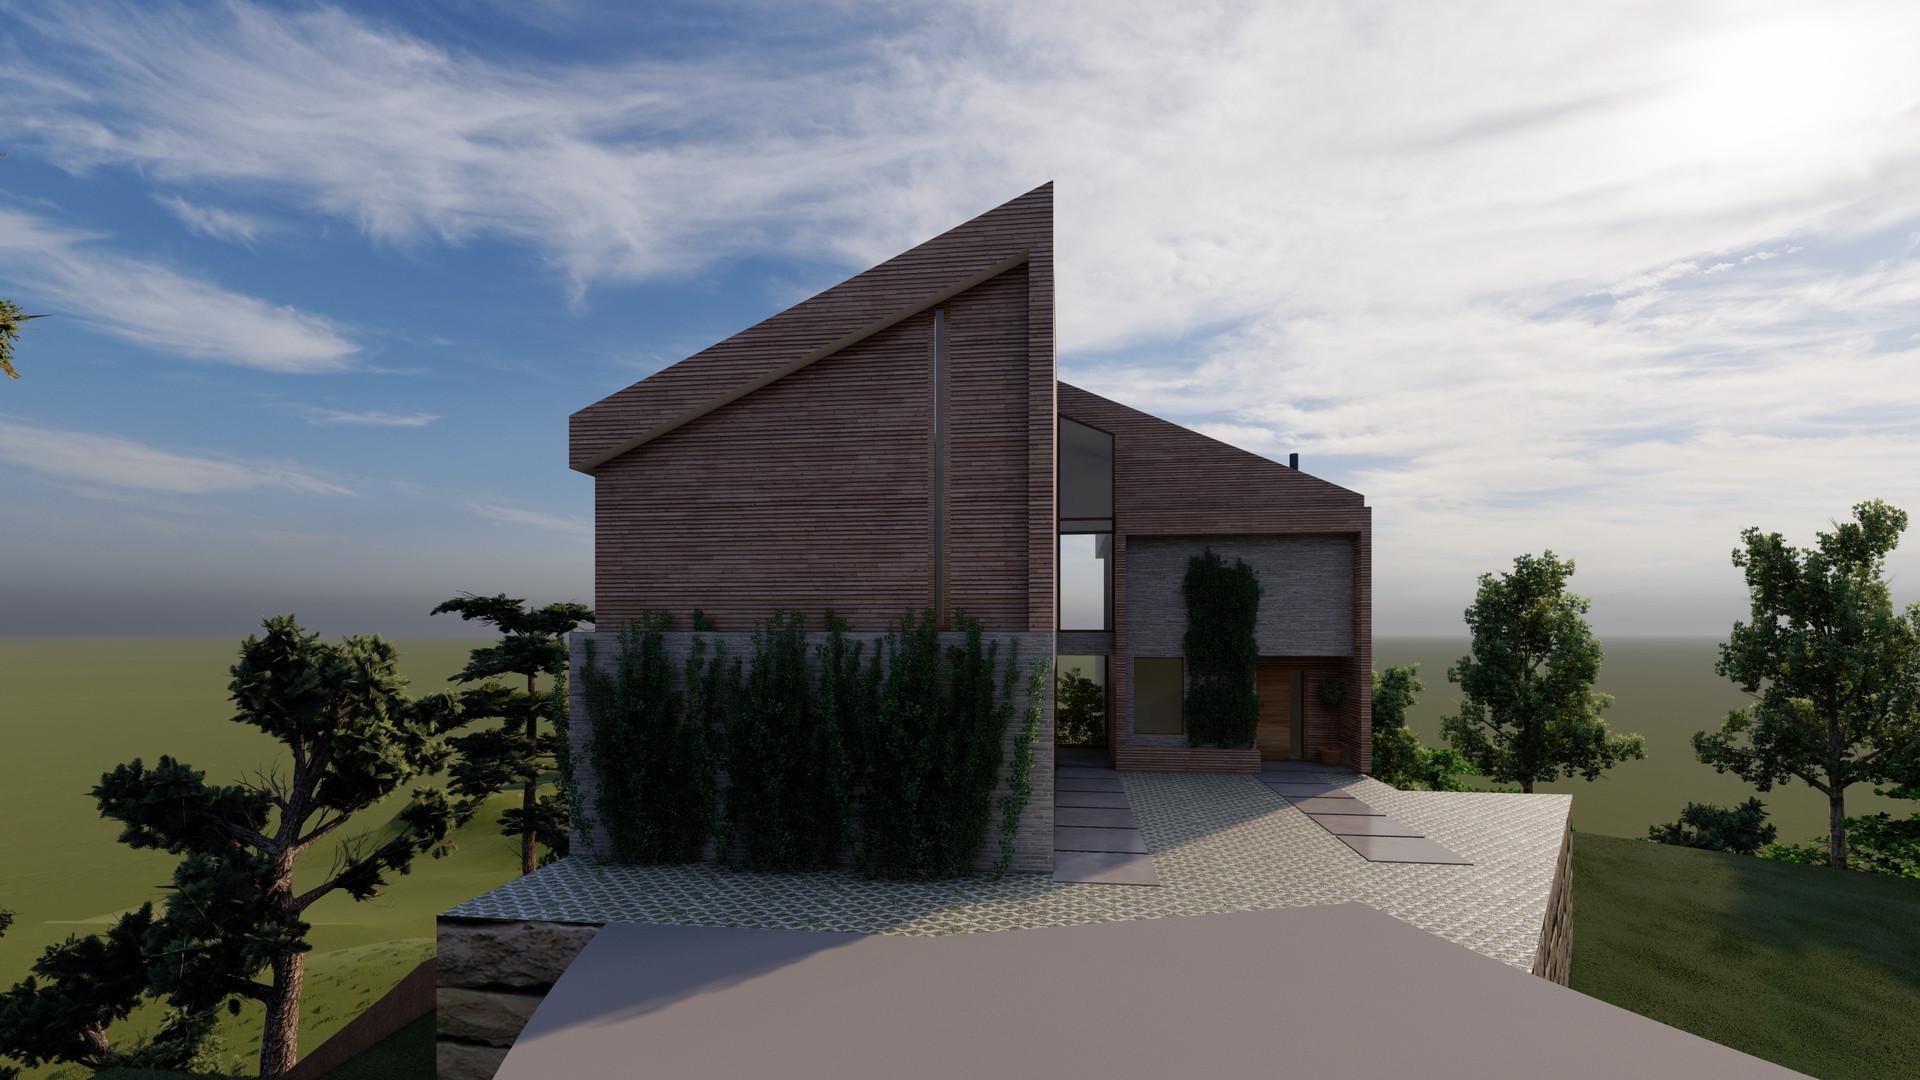 Enebolig Drangsvann_arkitektur.jpg